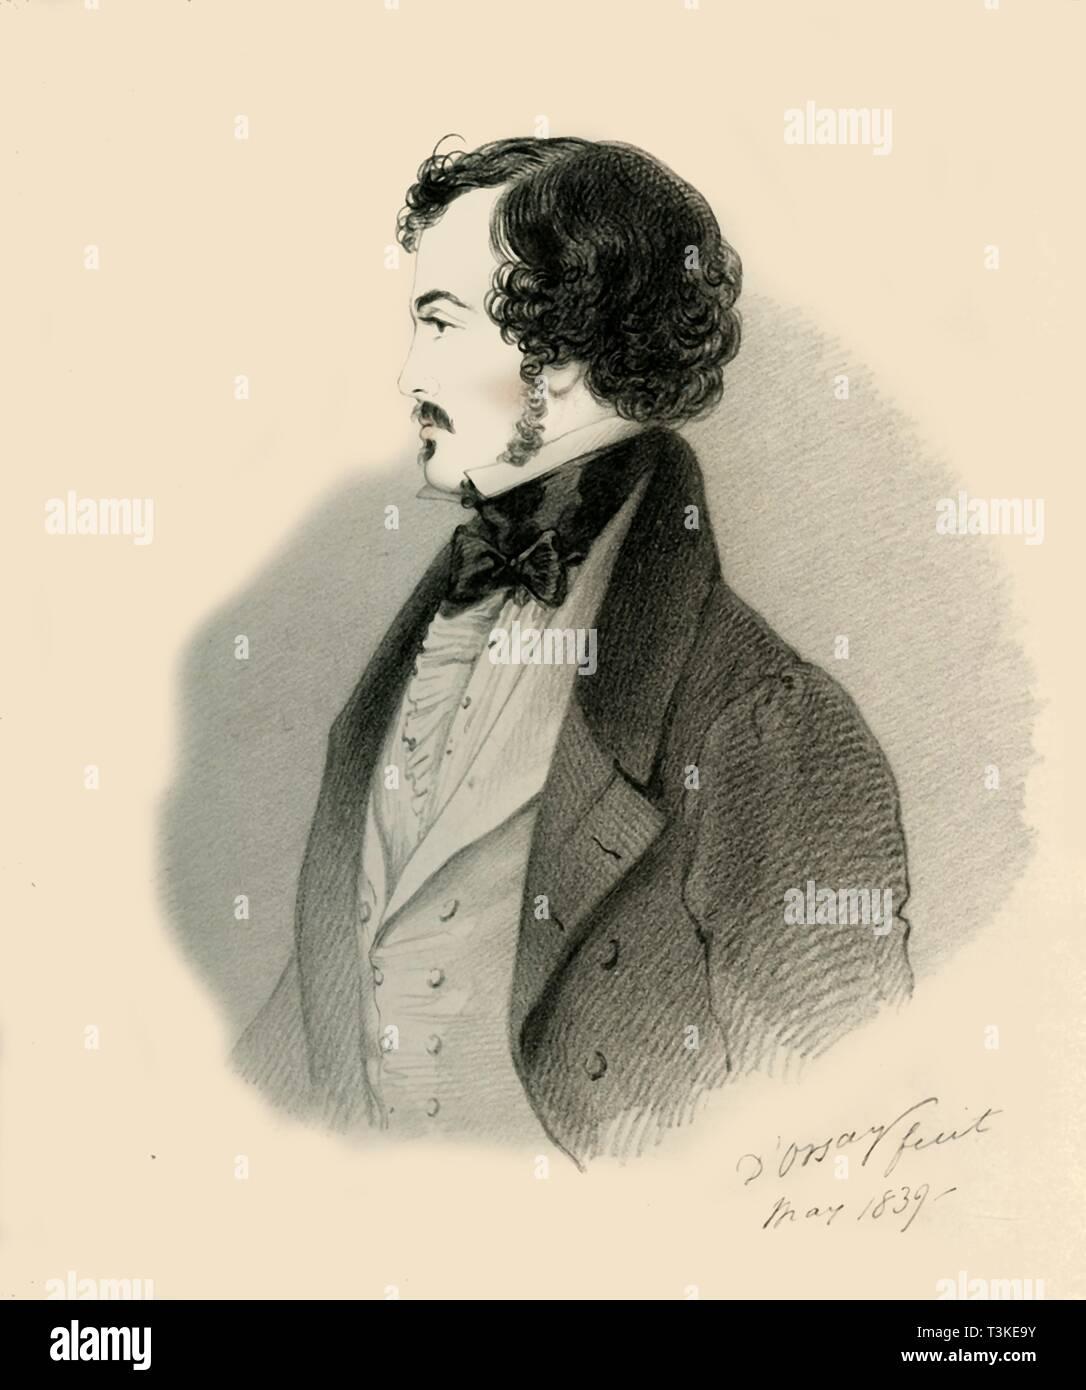 'Viscount Jocelyn', 1839. Creator: Richard James Lane. - Stock Image